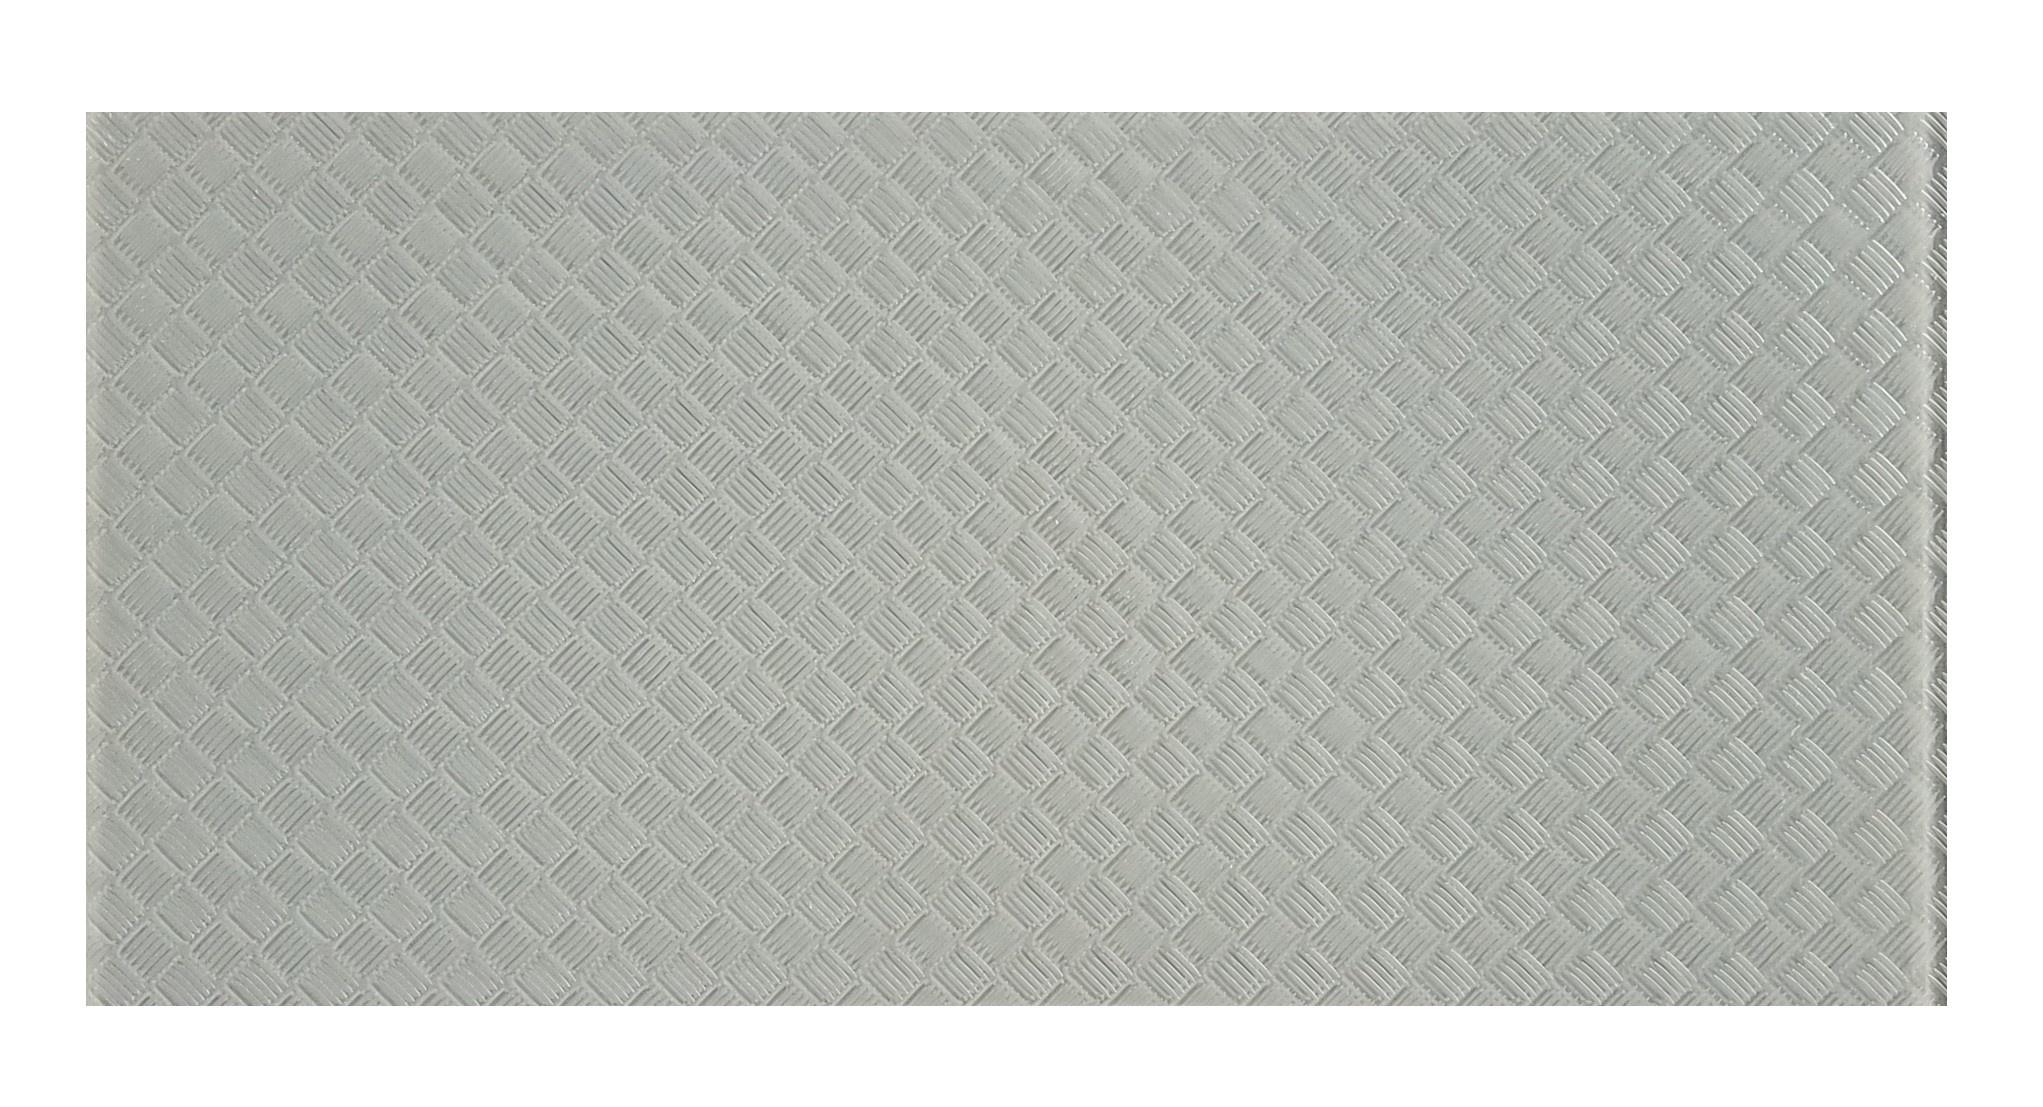 "Elements 12"" x 24"" Slip Resistant Light Gray Glass Field Backsplash Wall & Floor Tile"